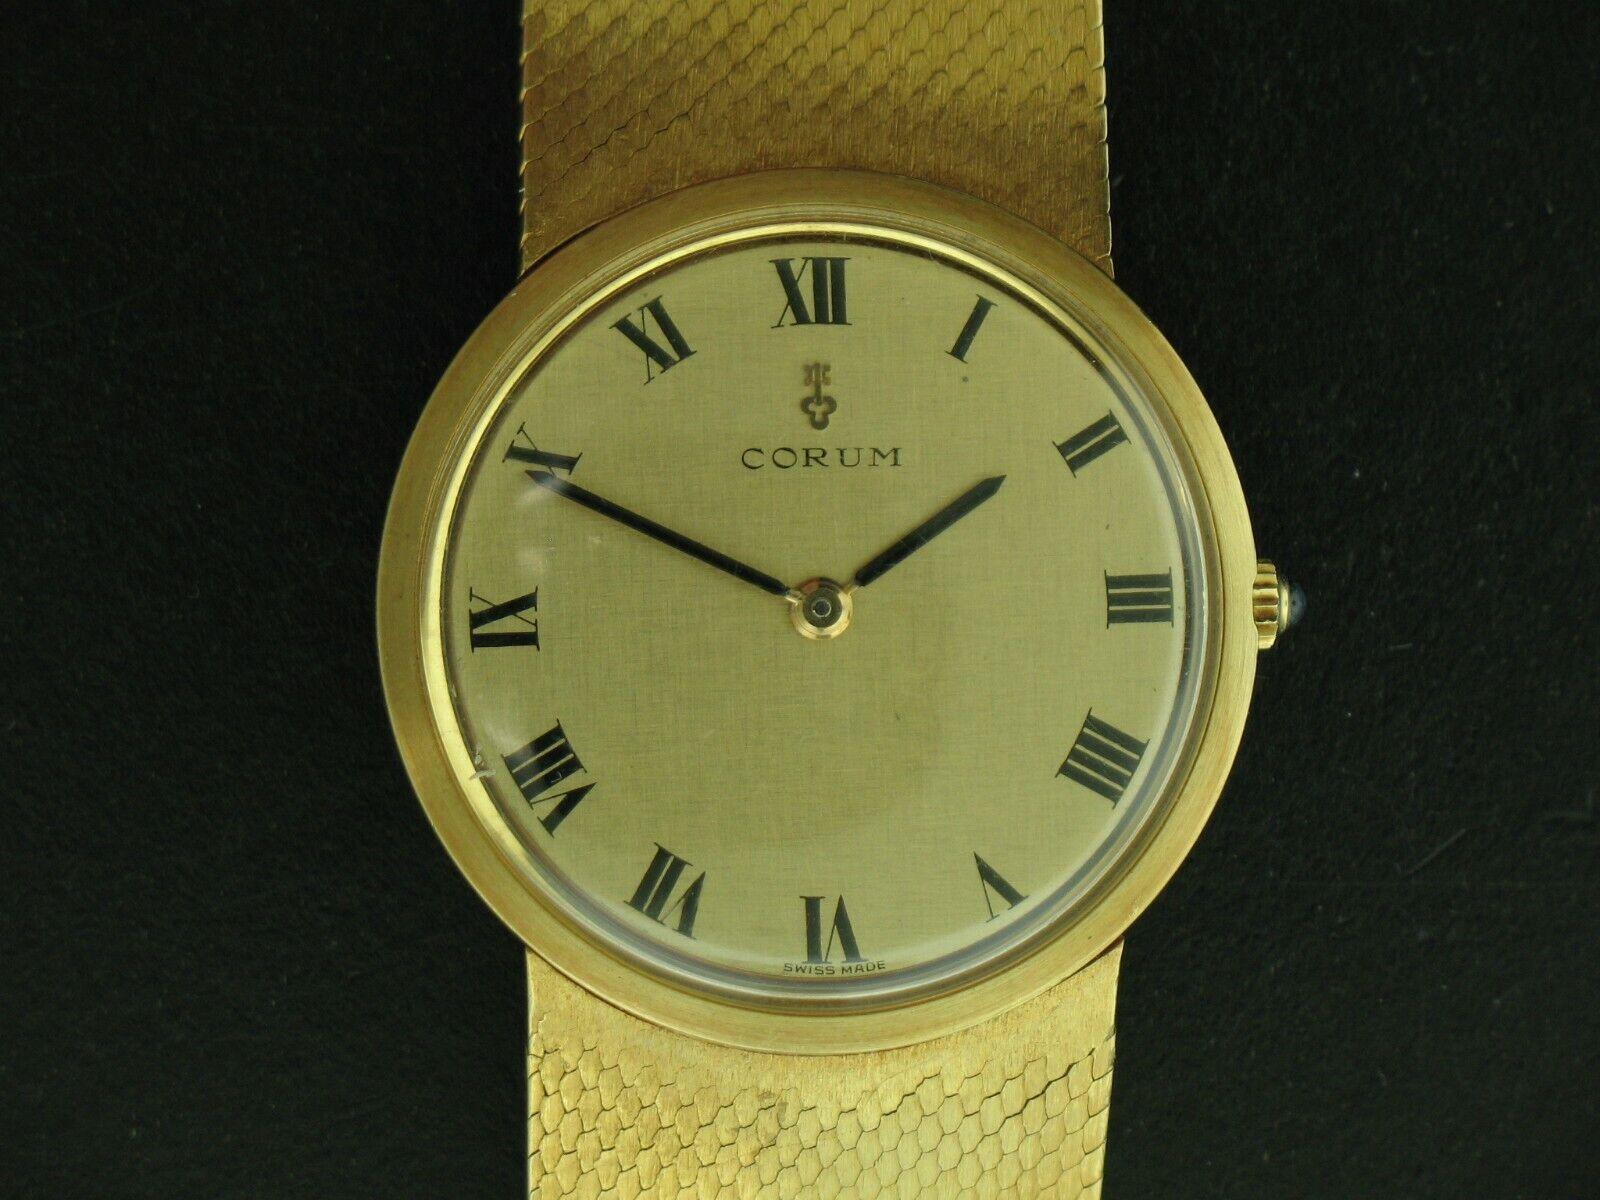 Corum 18K Yellow Gold Thin Dress Watch Mechanical Manual Wind 84.7 grams - watch picture 1